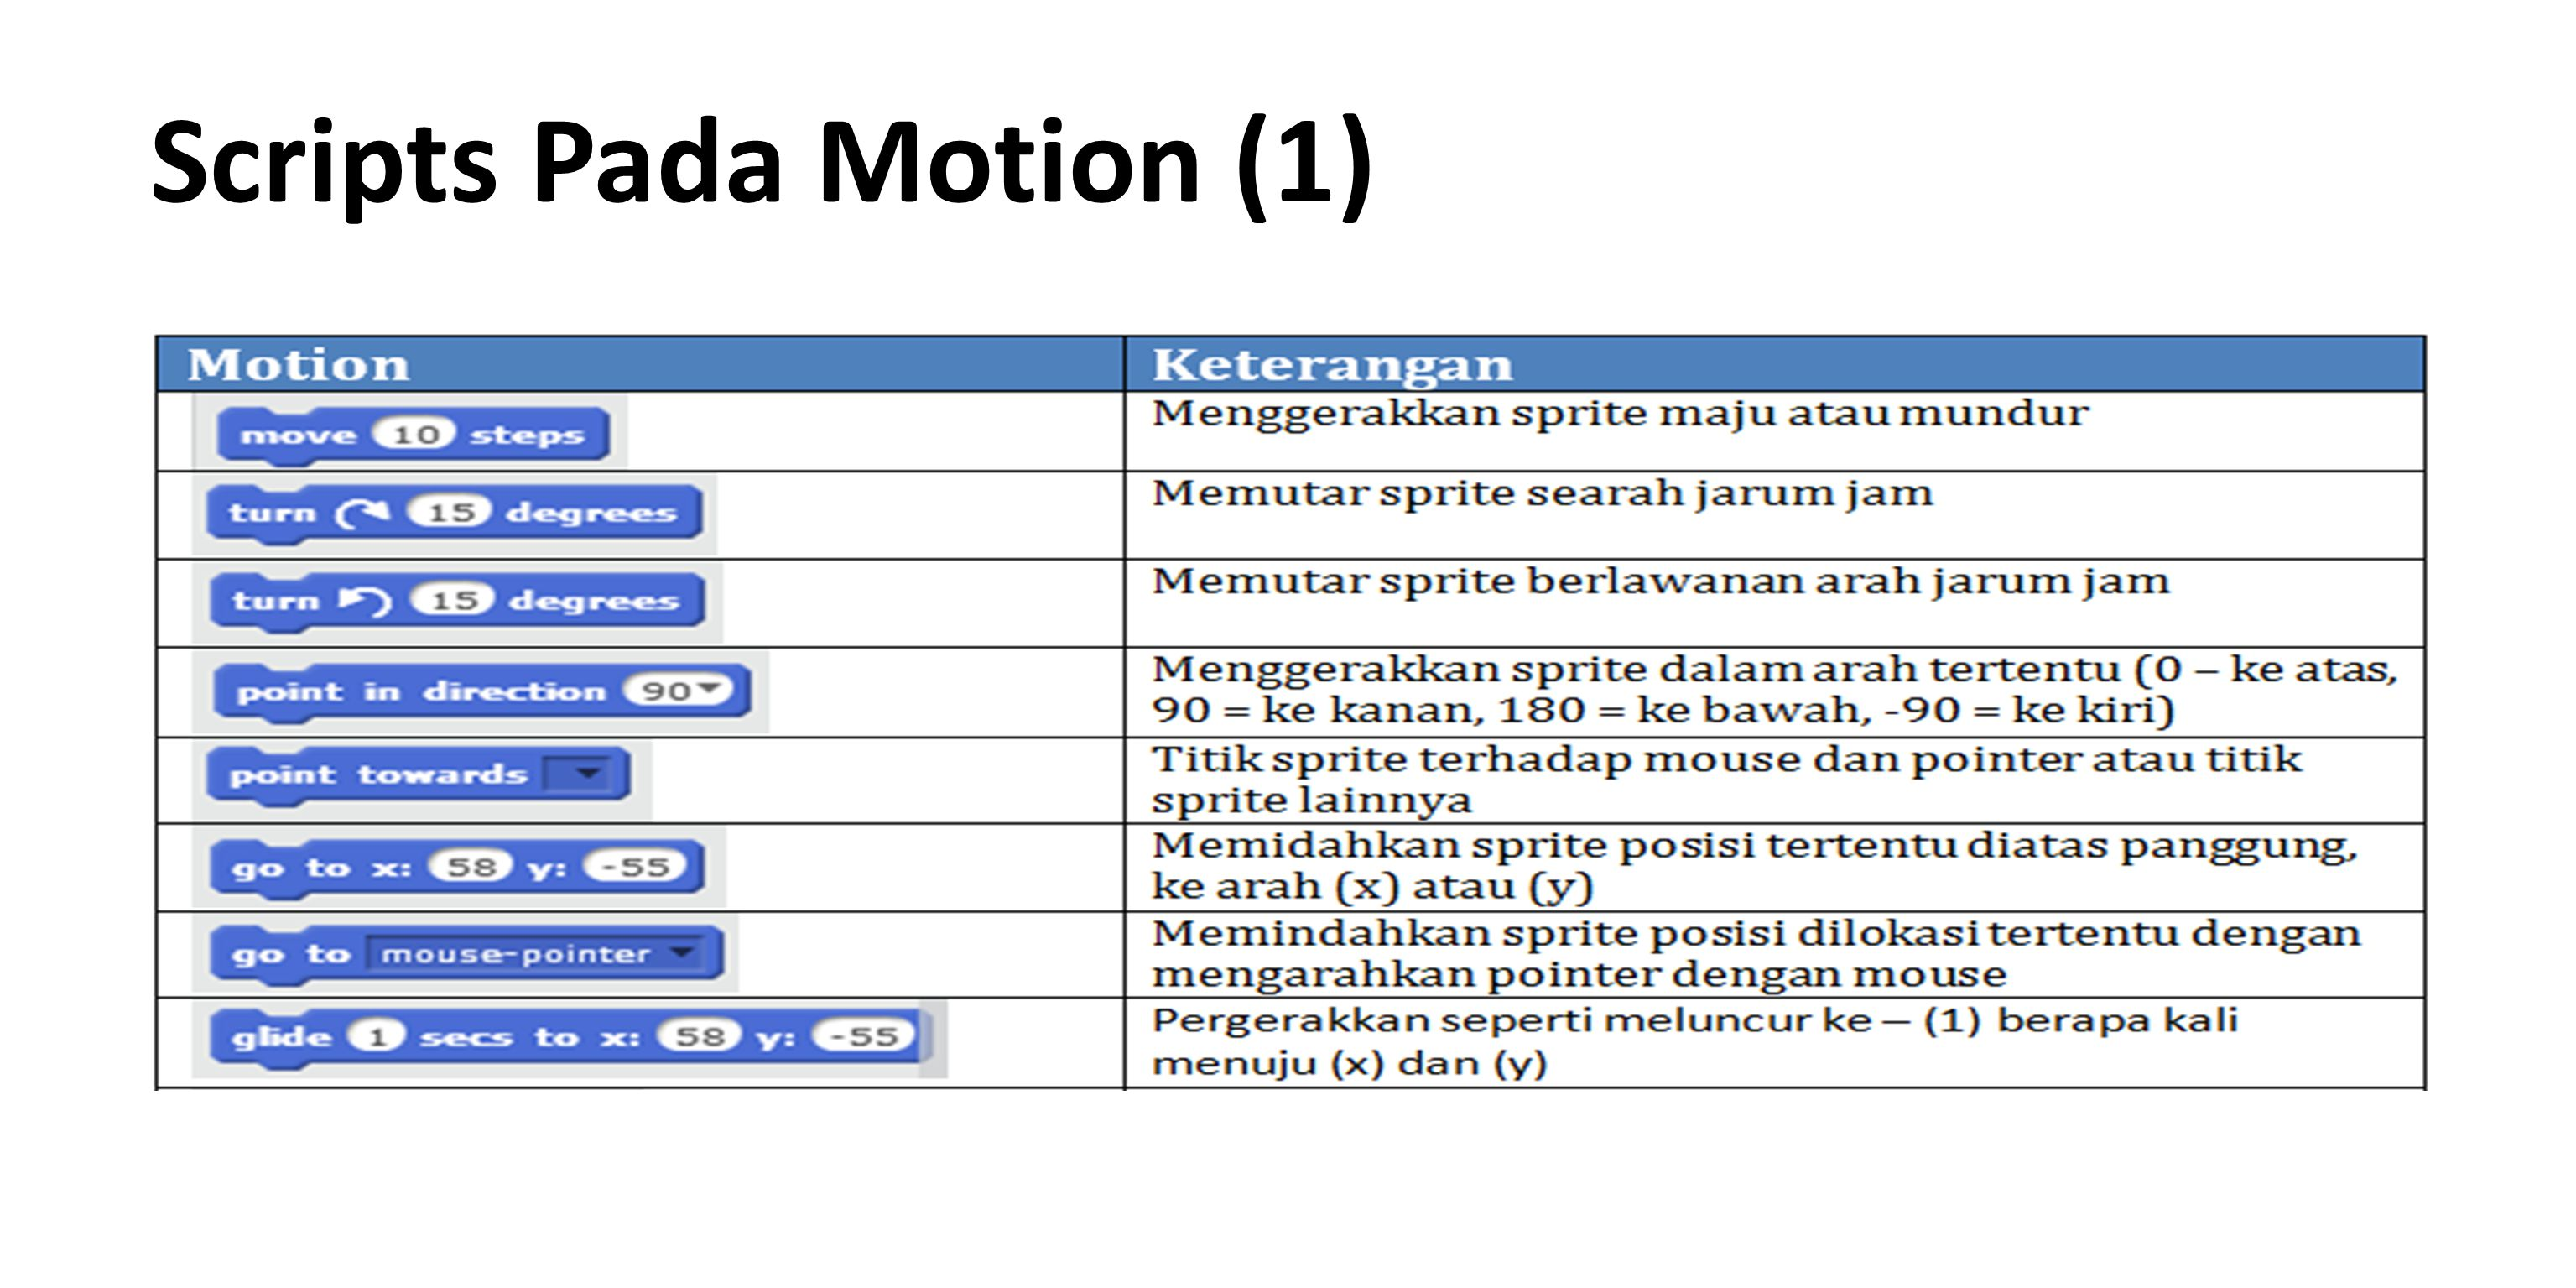 Scripts Pada Motion (1)